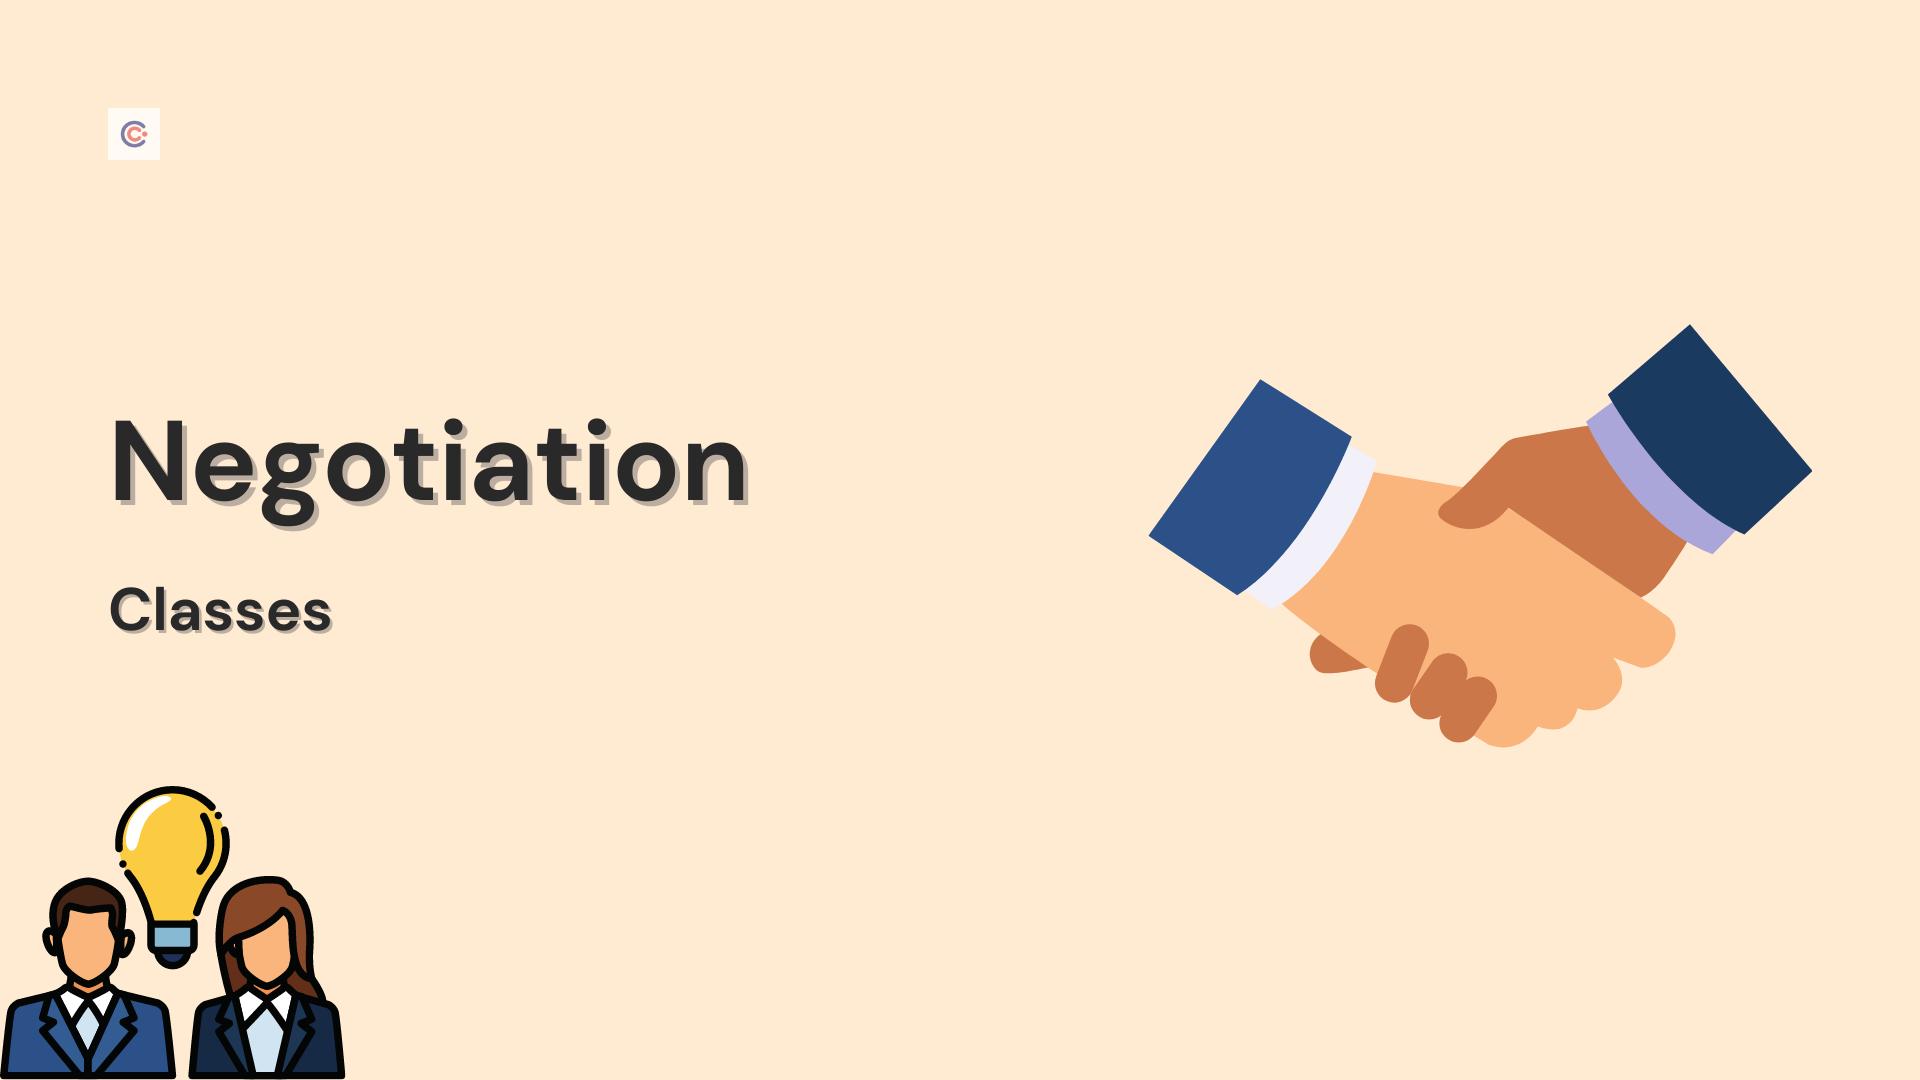 10 Best Negotiation Classes - Learn Negotiation Online